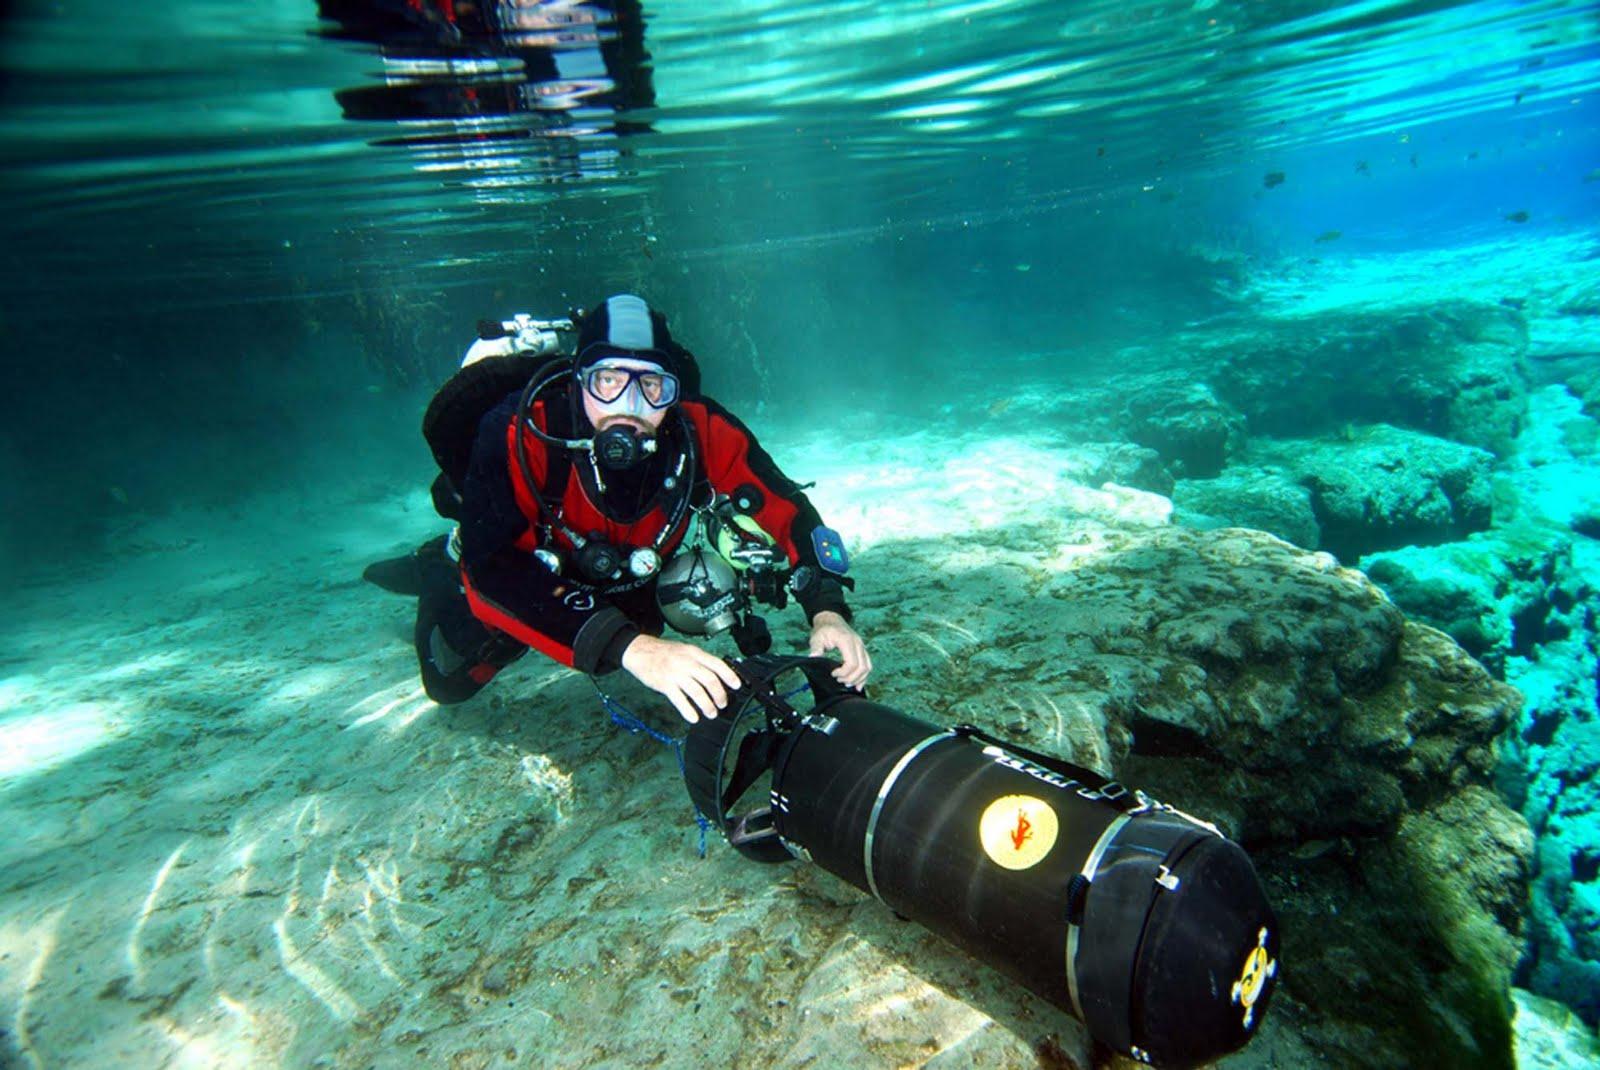 http://2.bp.blogspot.com/-yOvlwYt093o/Ti2K4lu2JEI/AAAAAAAAHgI/1cilSlkLuXM/s1600/Cave+diving+by+cool+images786+%25284%2529.jpg